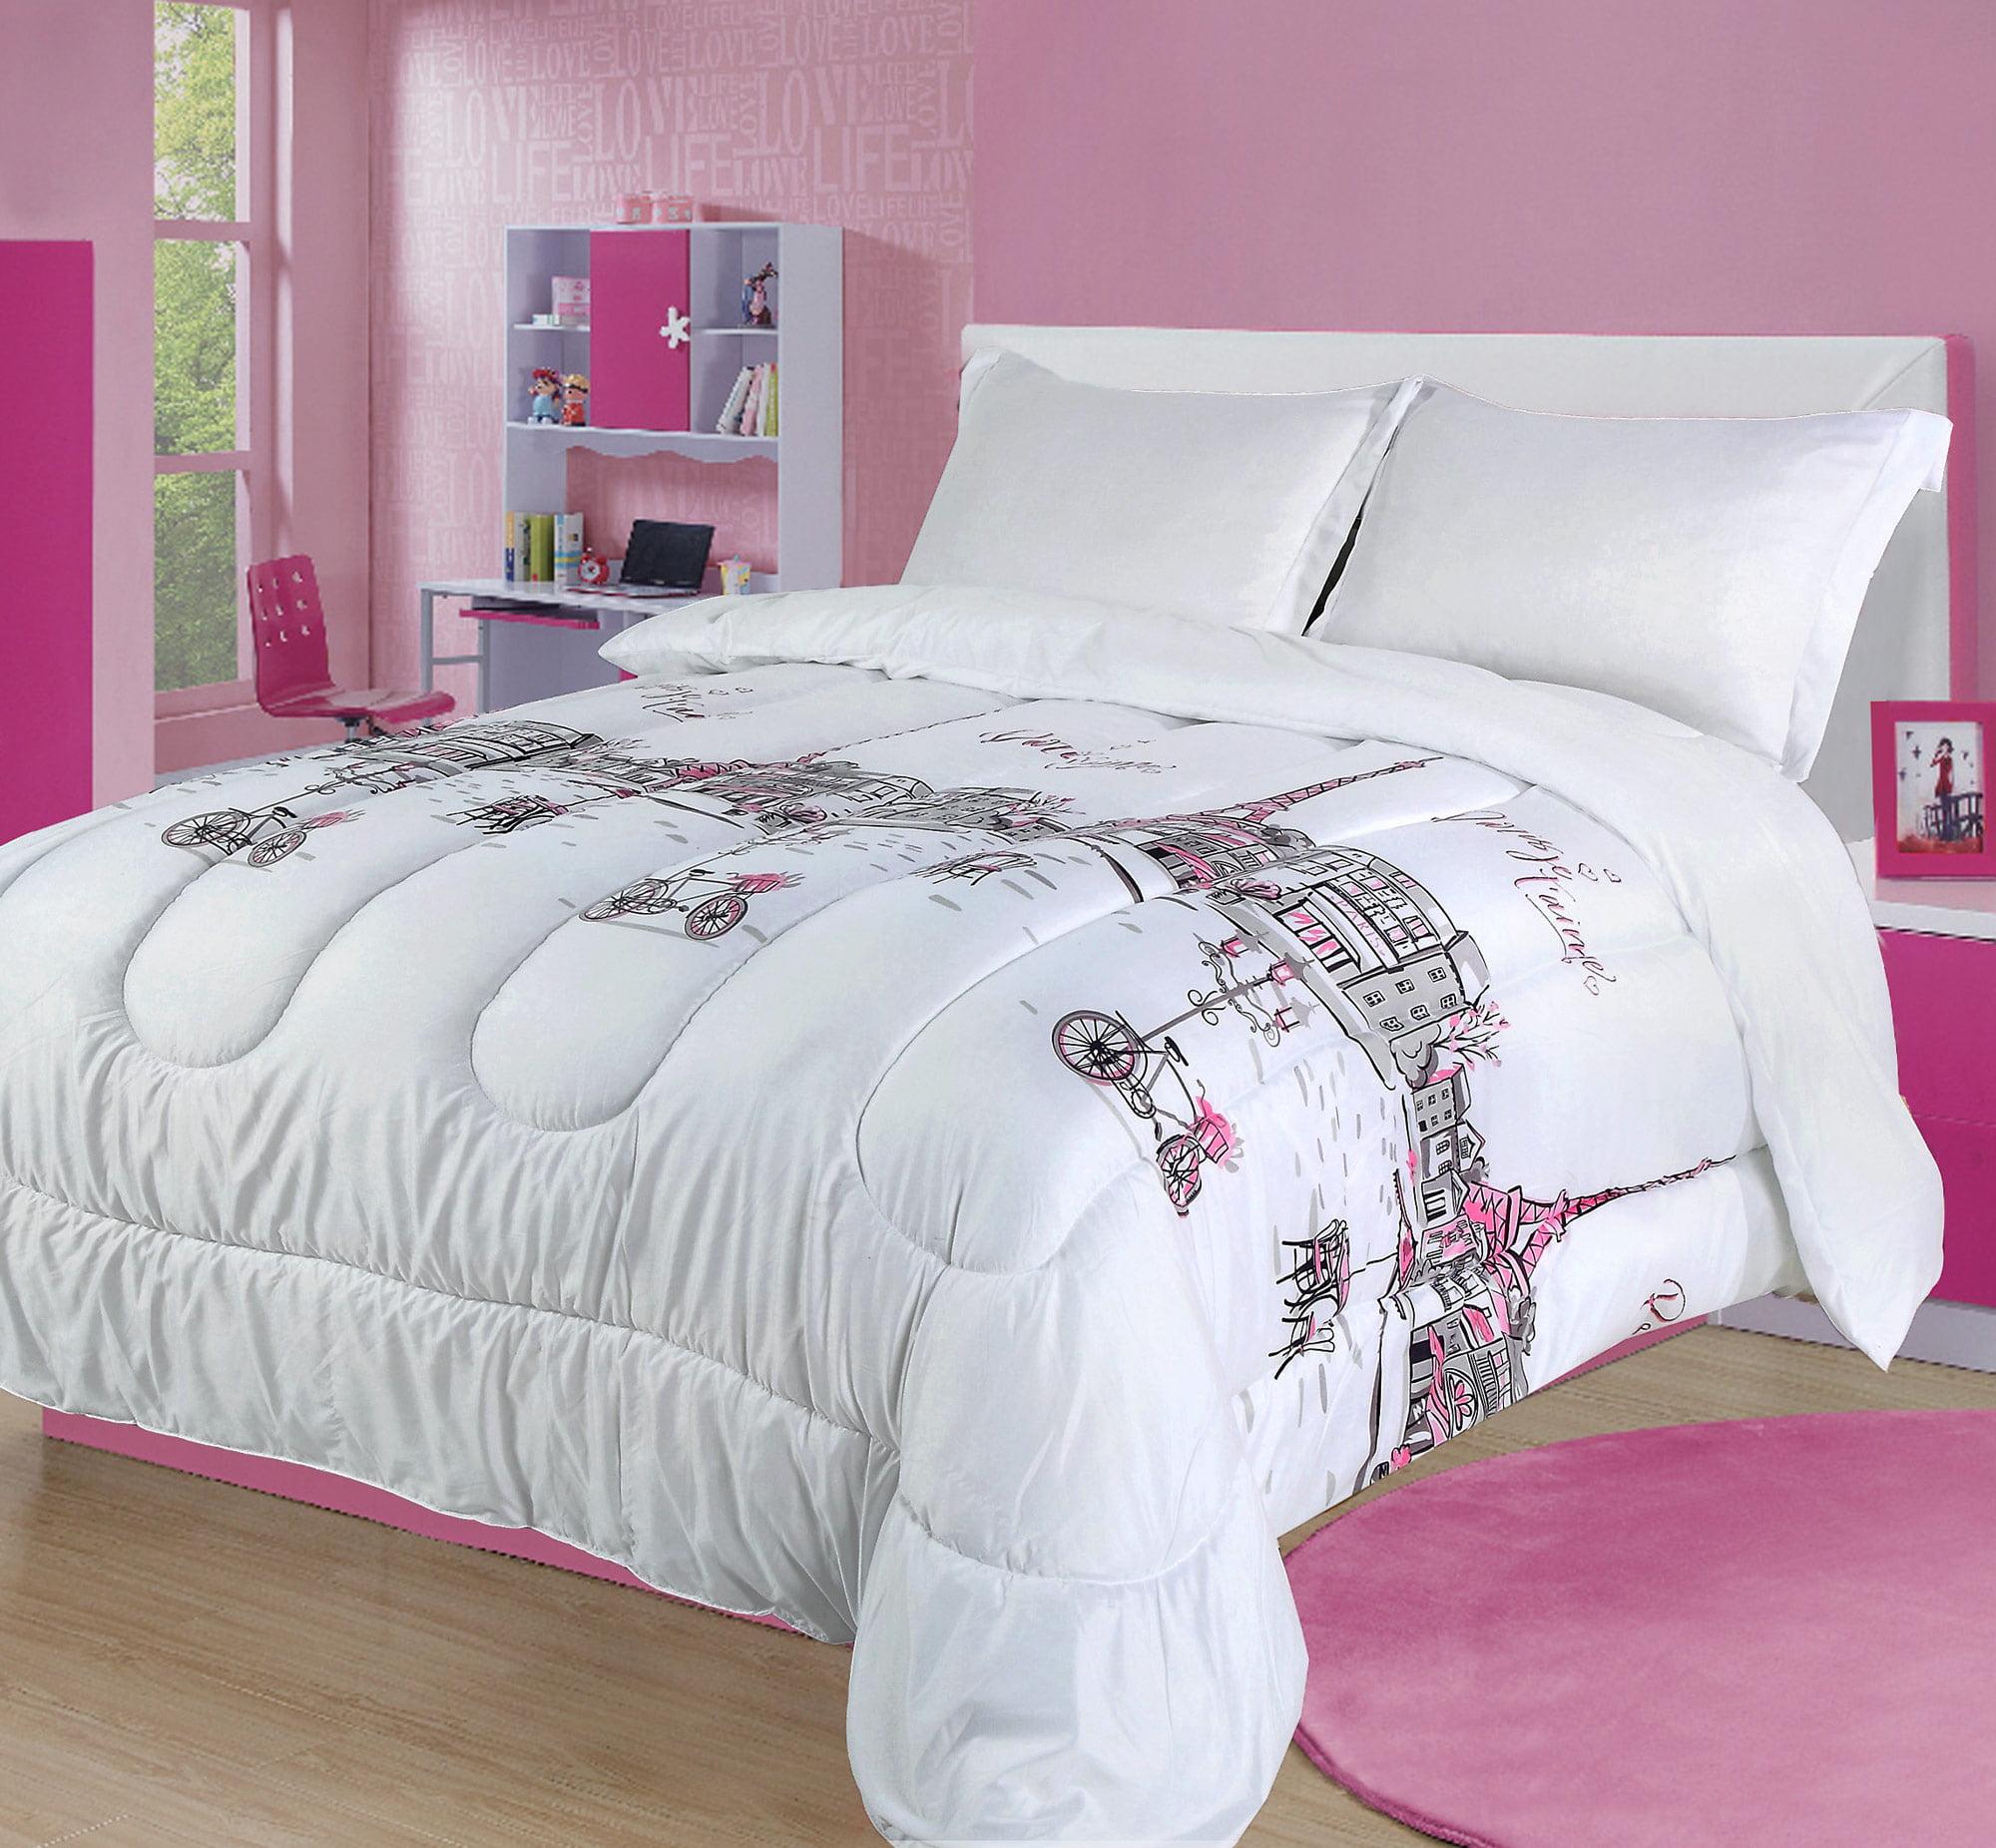 Twin Paris Comforter Bedding Set France Pink White Grey Eiffel Tower